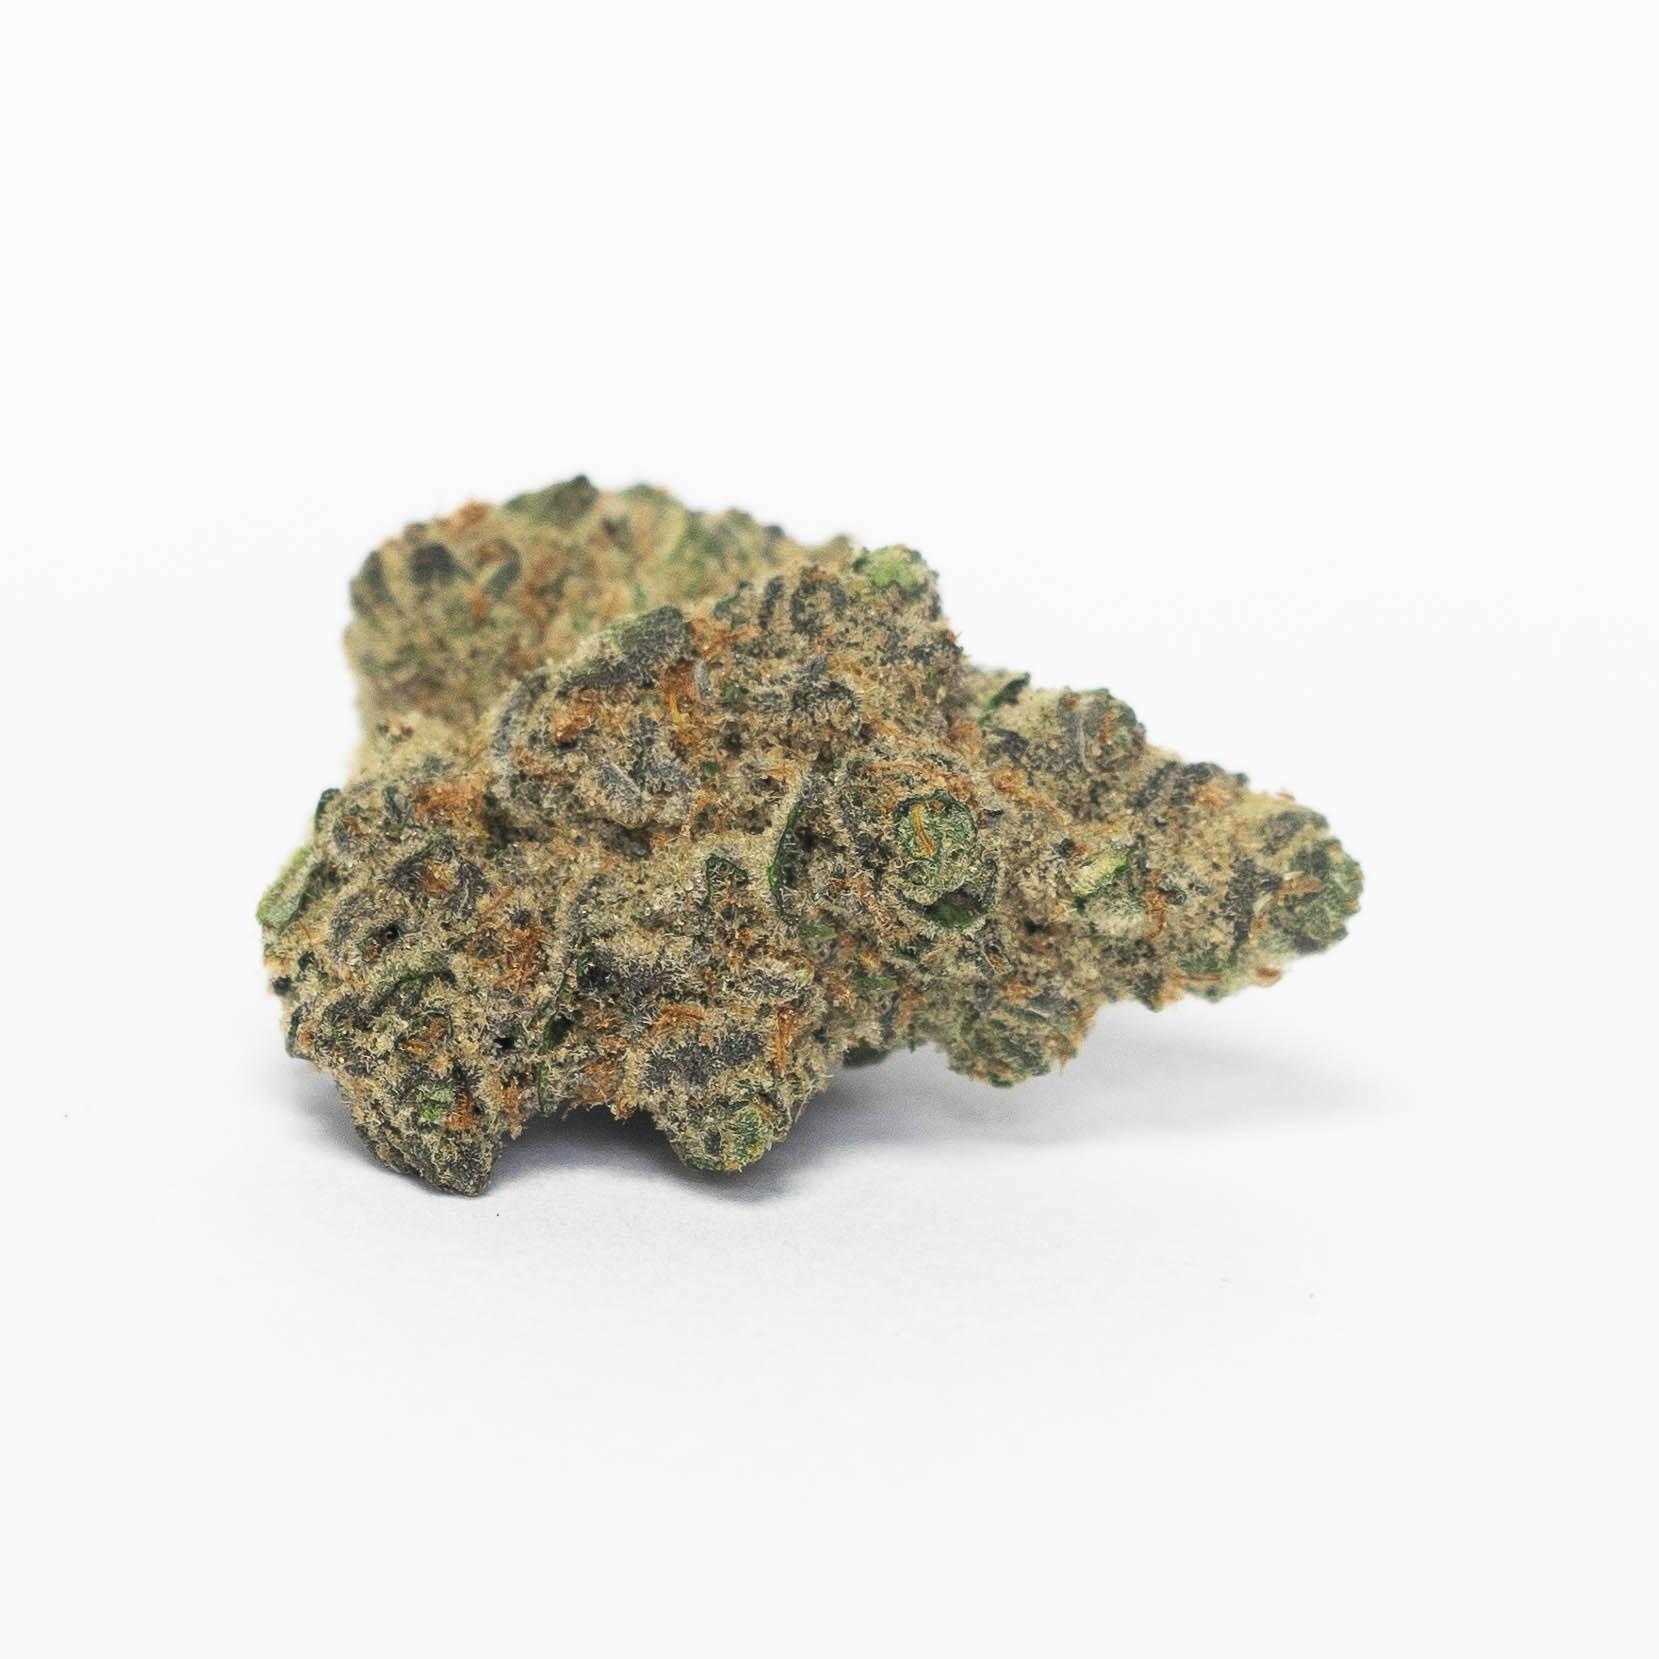 Tangimal Cookies - Jarred 1/8th  cannabisstores